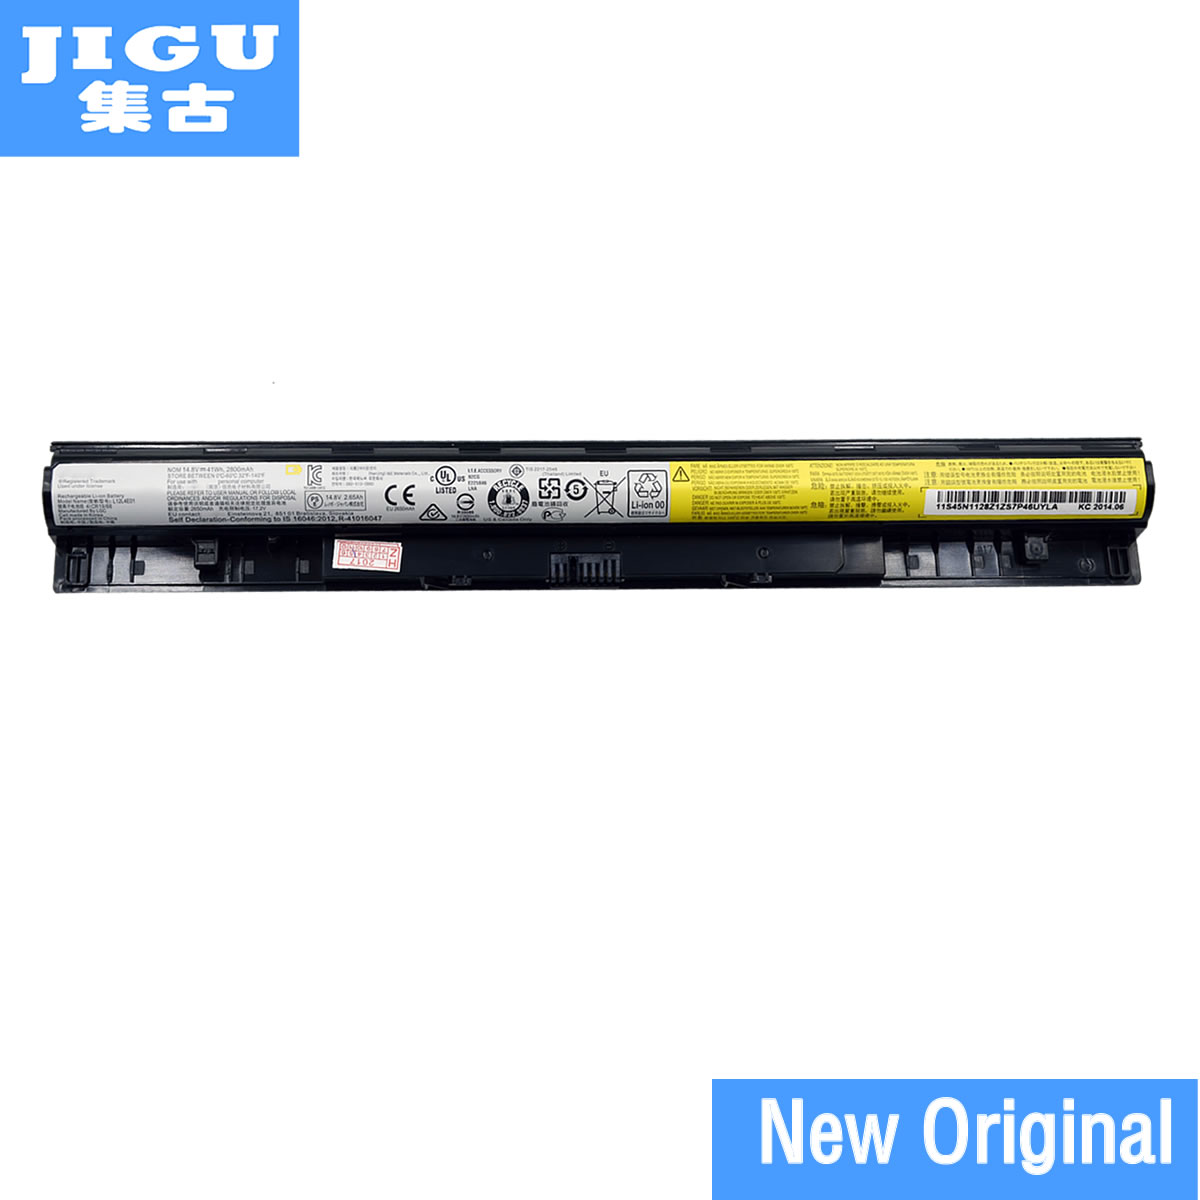 JIGU Original L12L4E01 Laptop Battery For LENOVO G400S G405S G410S G500S G505S G510S S410P S510P Z710 L12S4A02 L12M4E01 L12S4E01 jigu new battery l11l6y01 l11s6y01 for lenovo y480p y580nt g485a g410 y480a y480 y580 g480 g485g z380 y480m